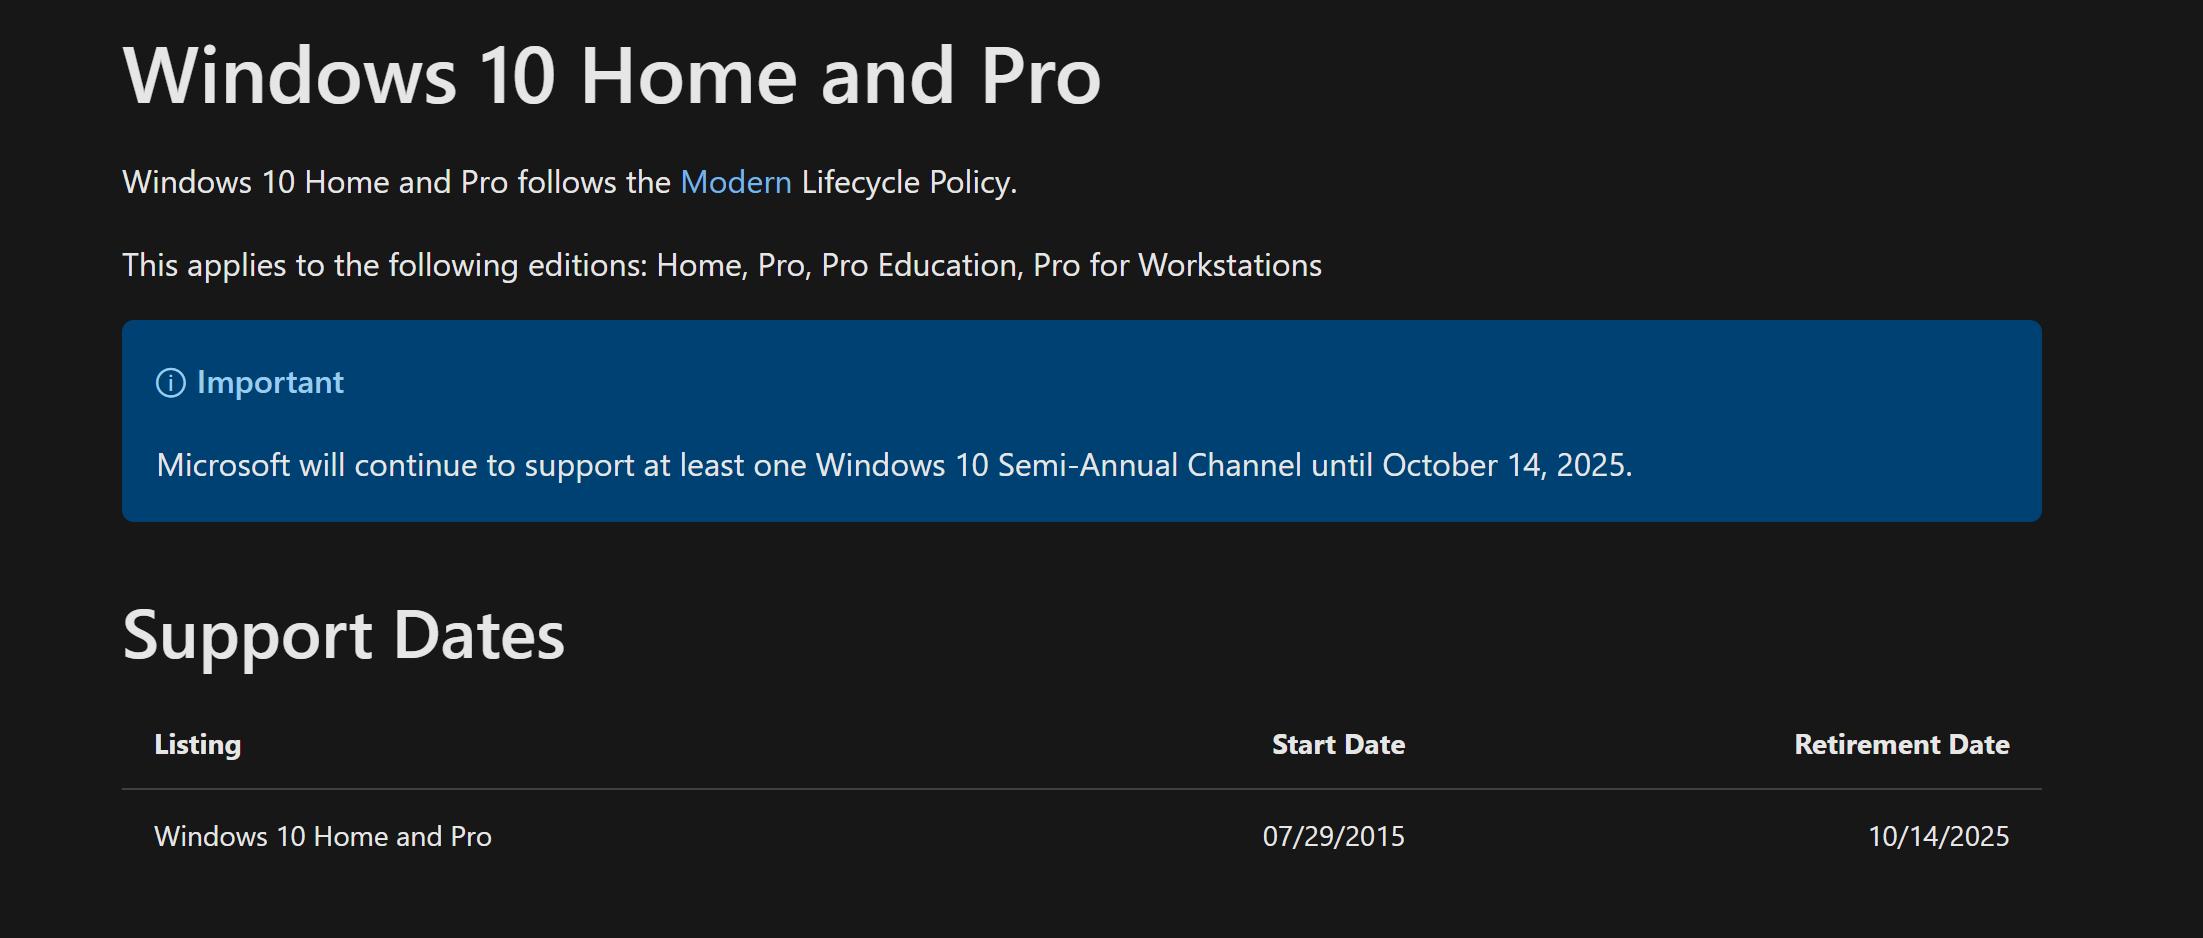 Screenshot showing Windows 10's retirement date